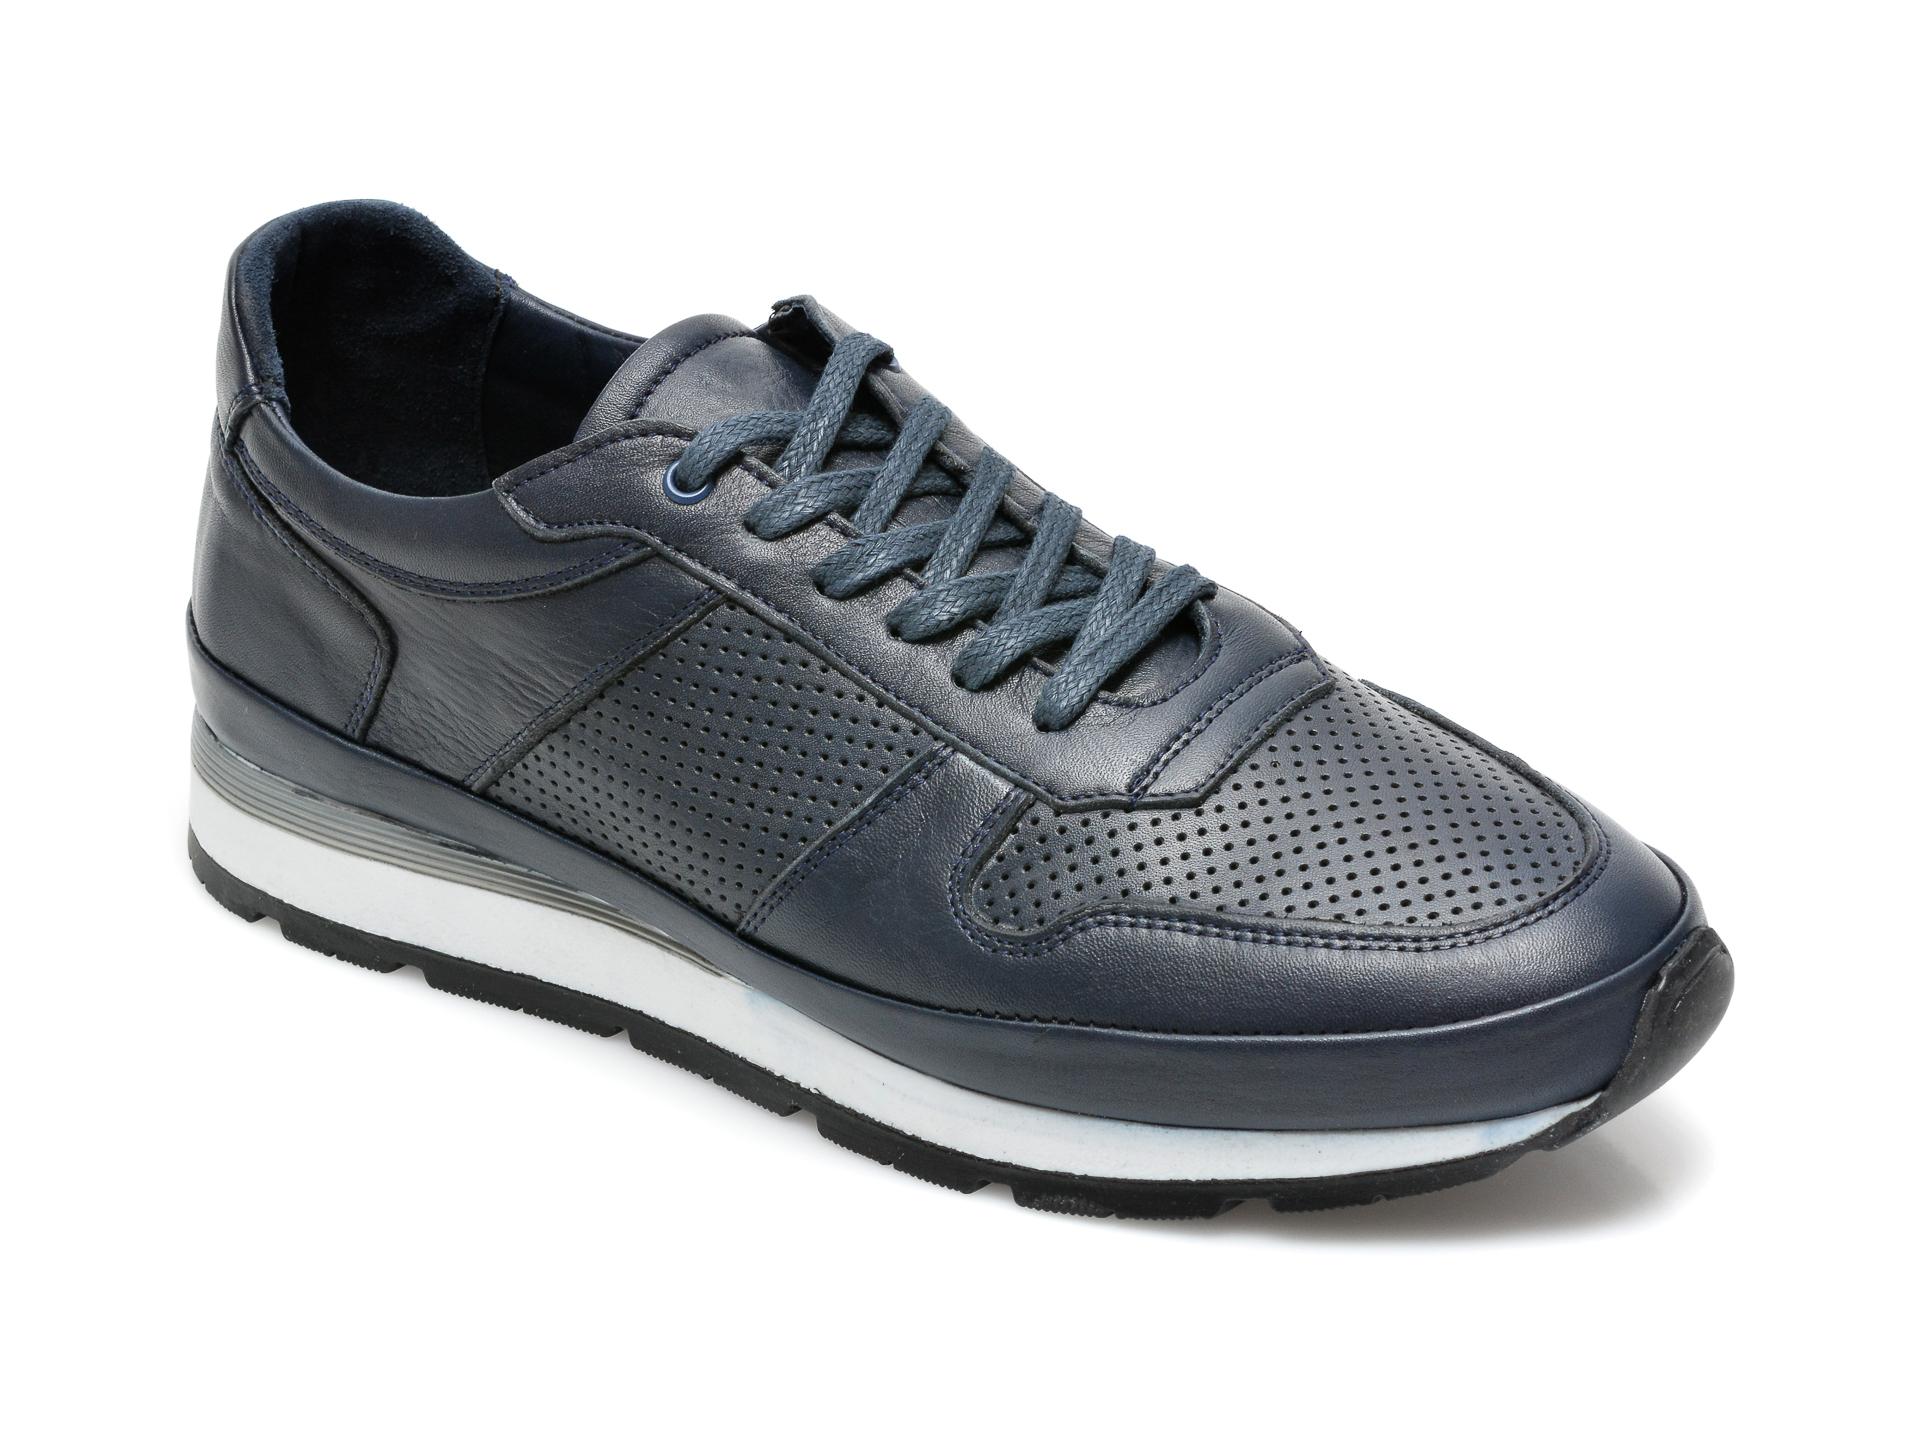 Pantofi OTTER bleumarin, M6094, din piele naturala